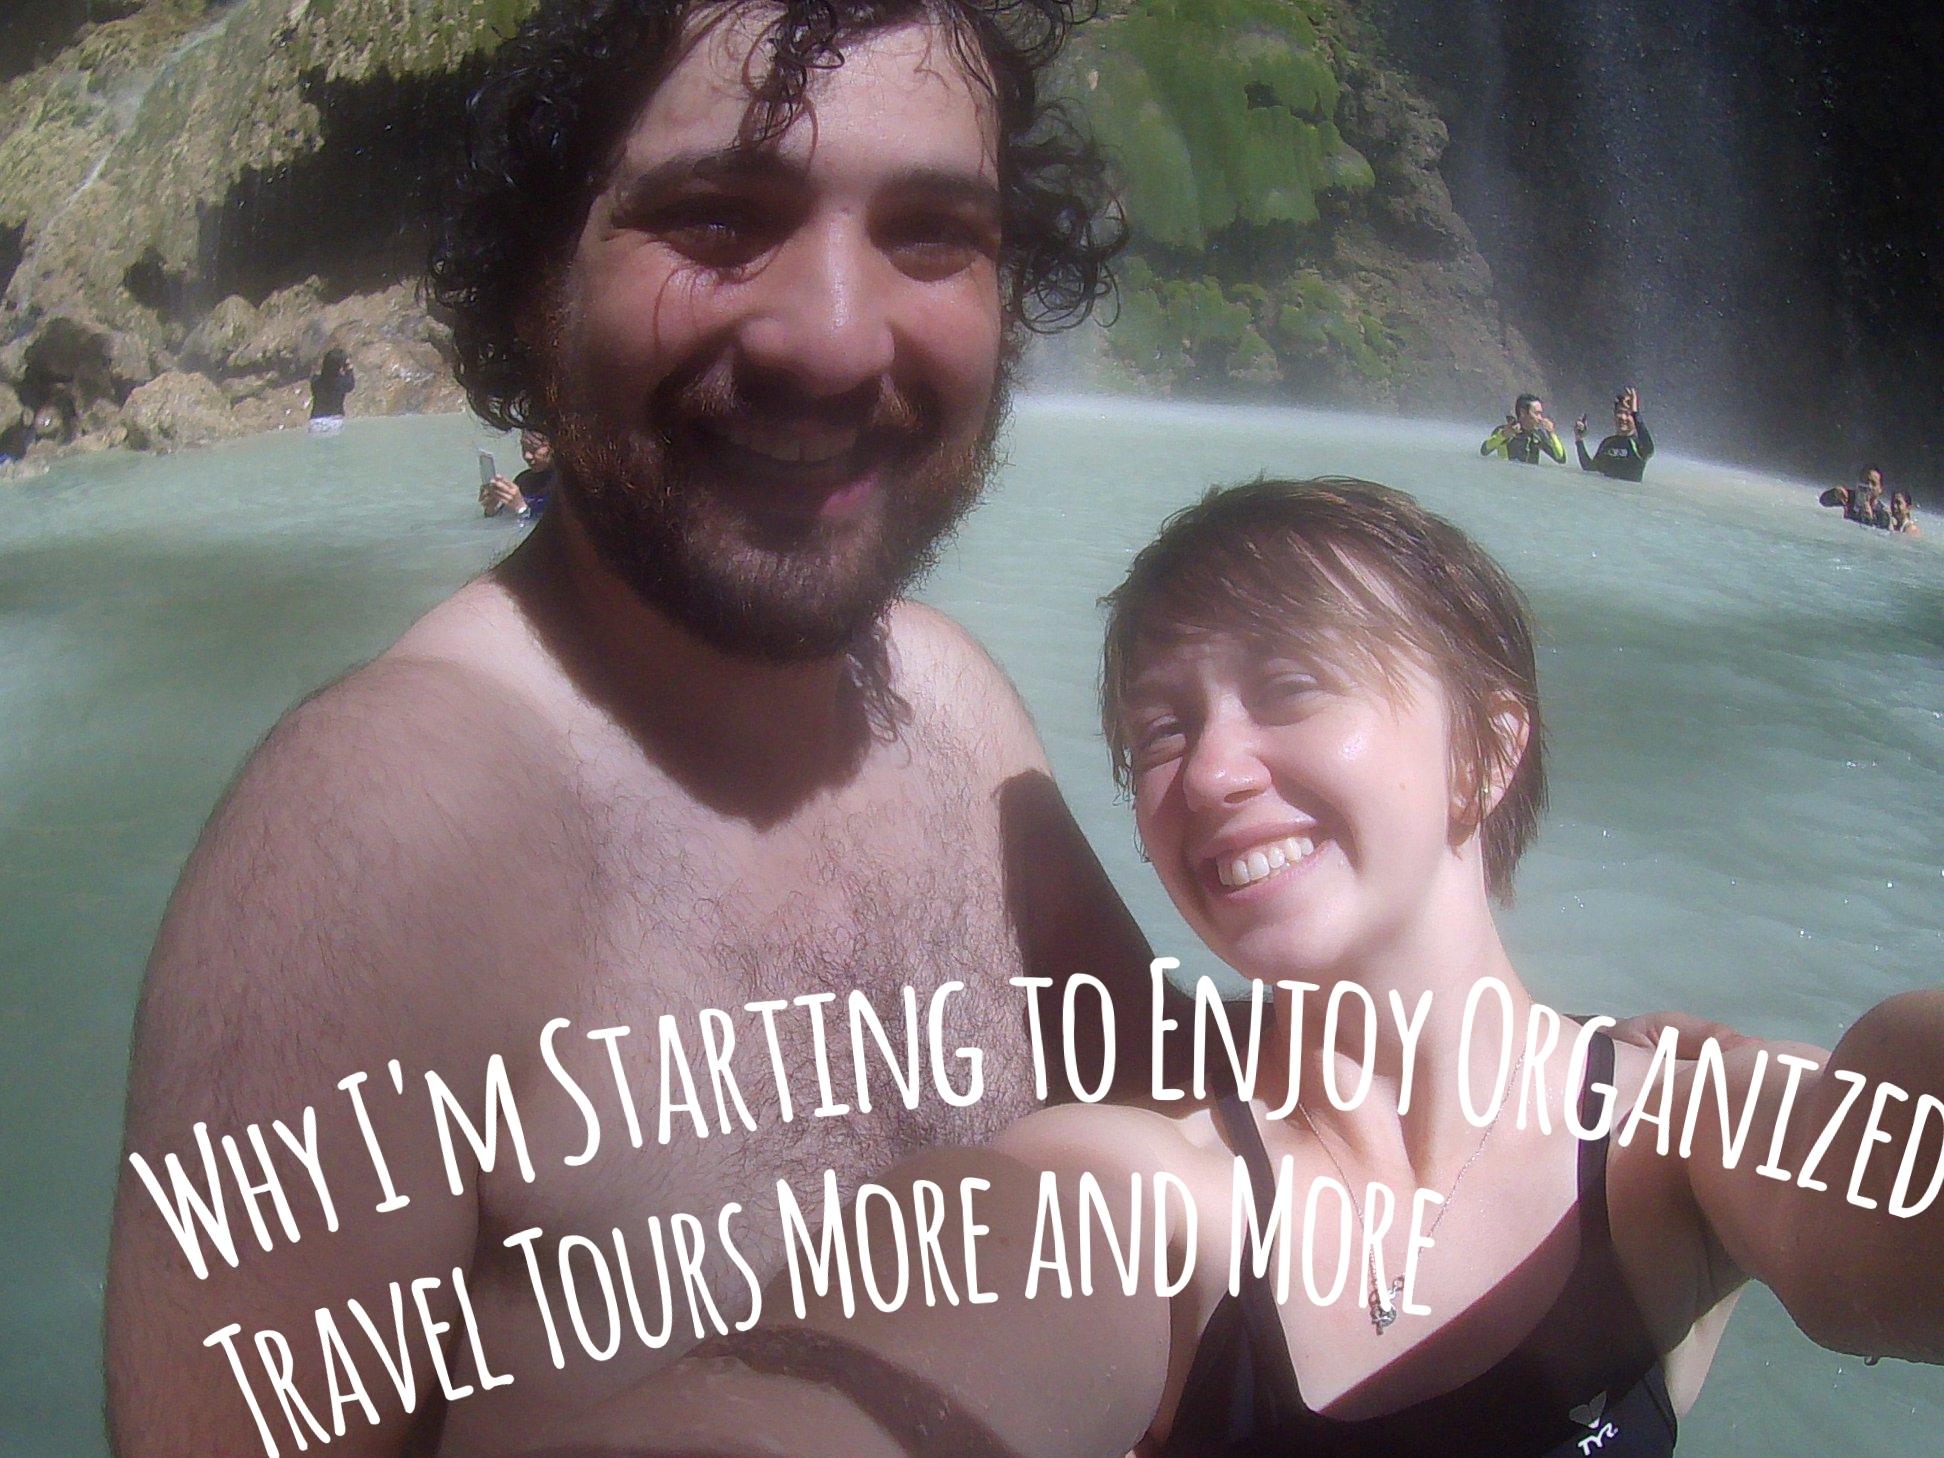 advantages of taking organized travel tours